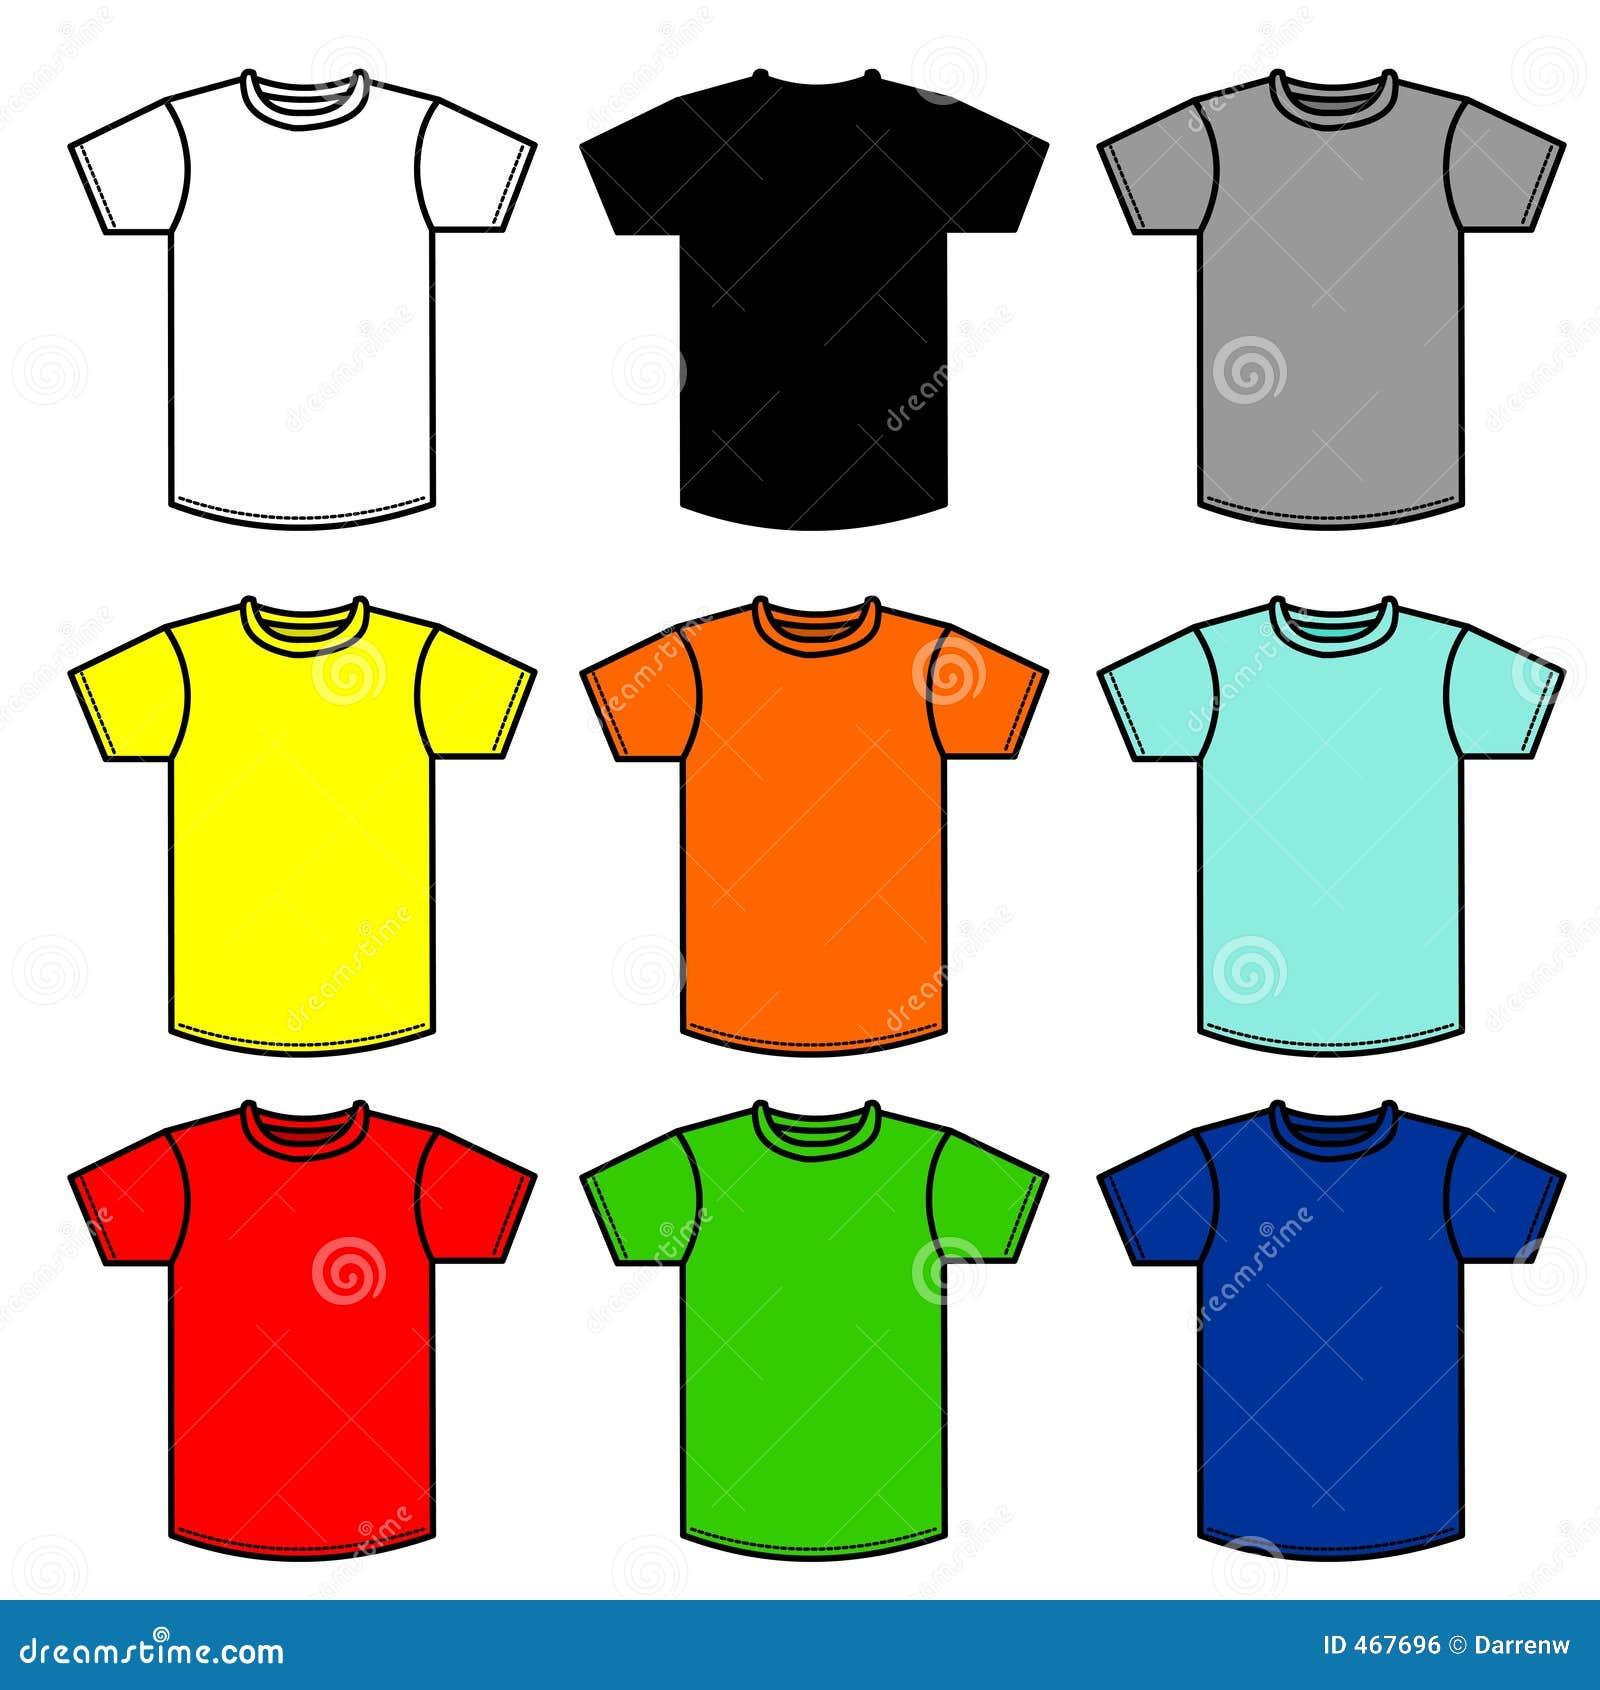 90 shirts